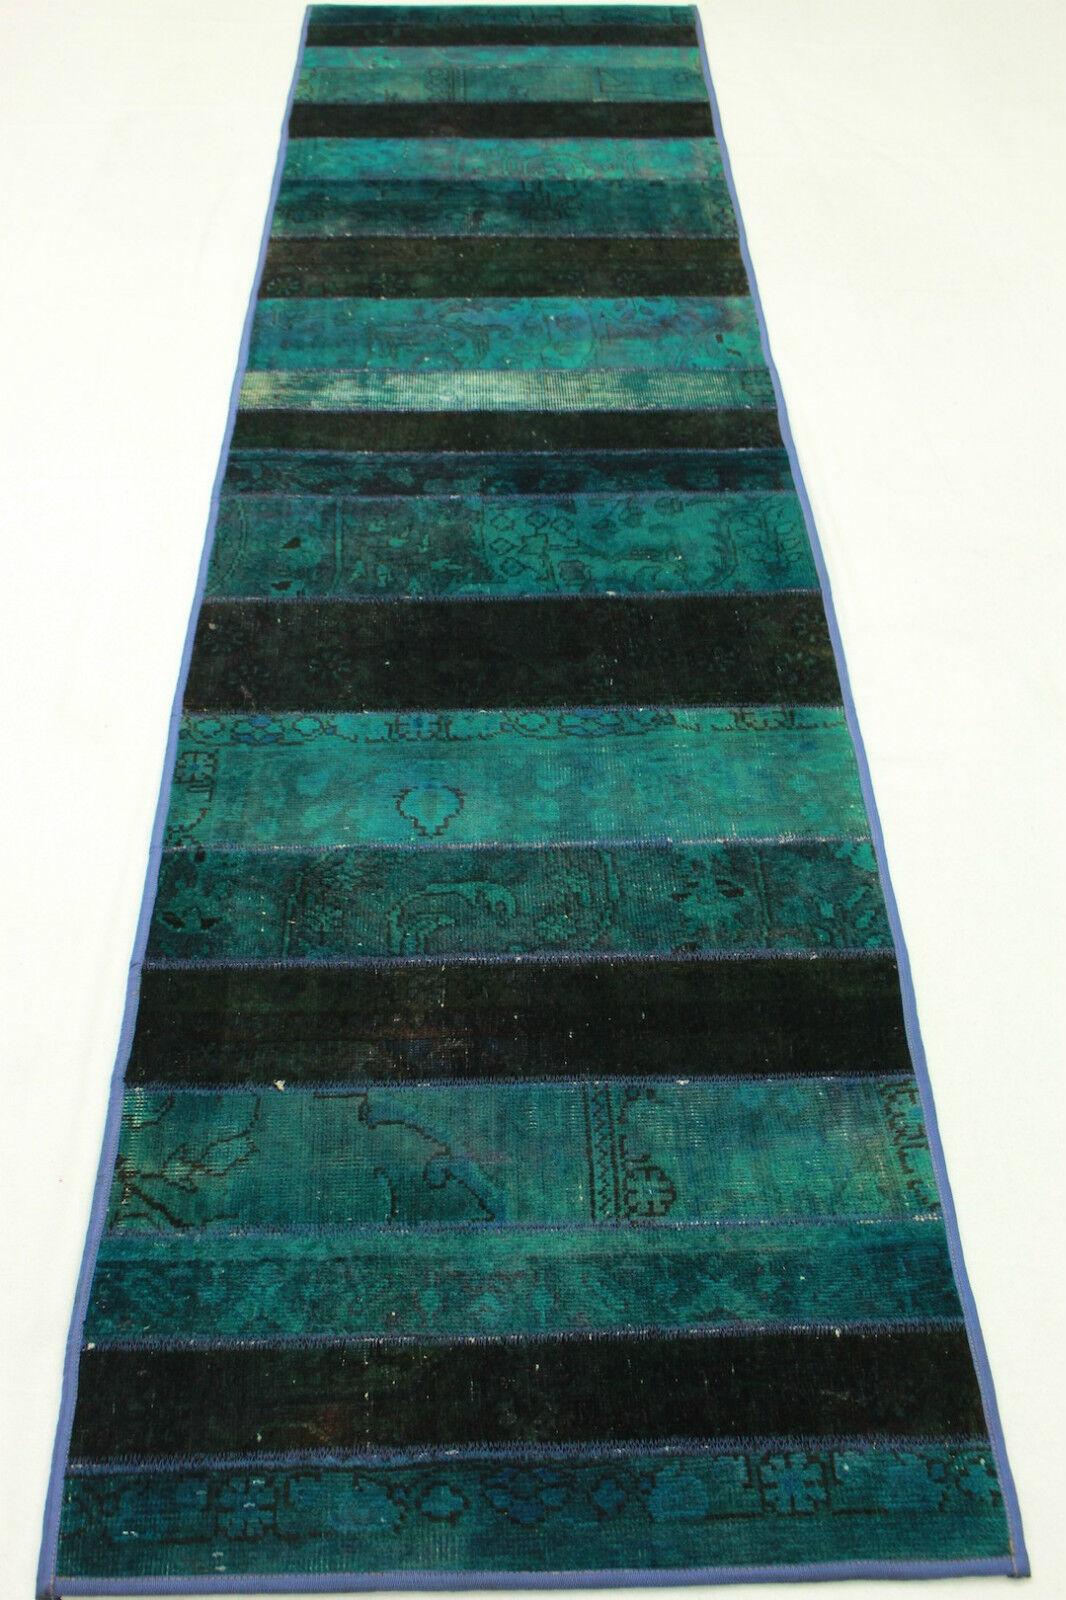 Orient alfombra patchwork alfil vintage overdyed turquesa hip 310x80 look usado 924